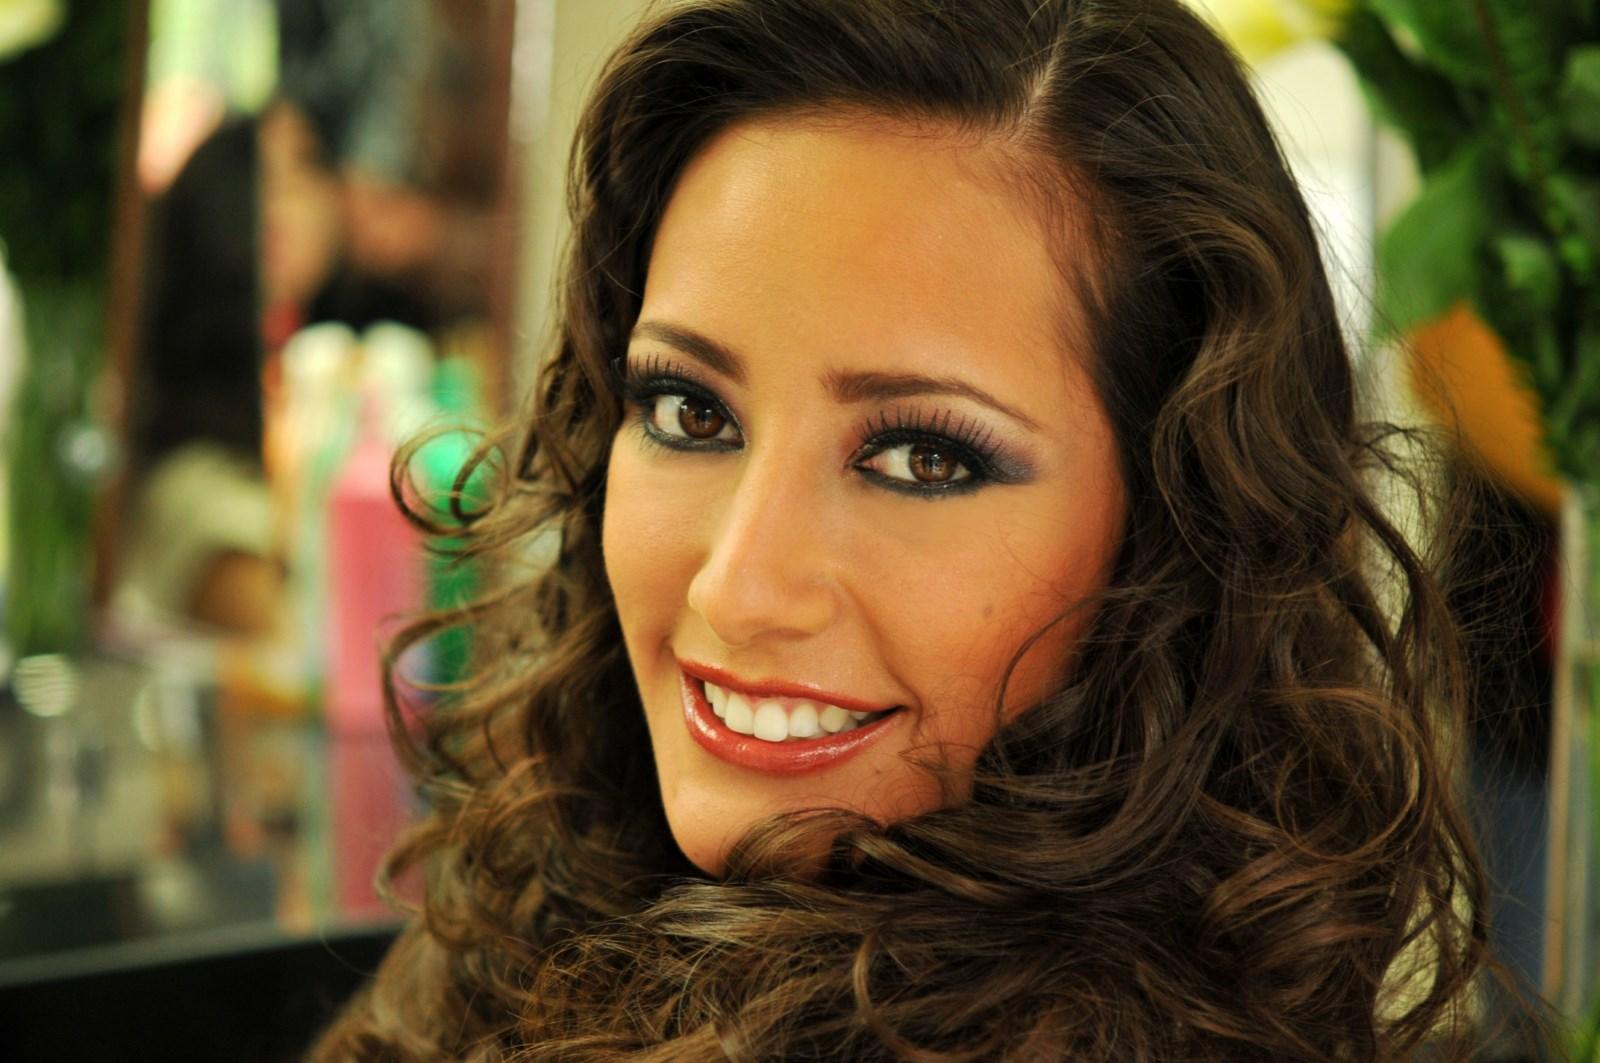 La belleza de Miss bolivia en Rusia.